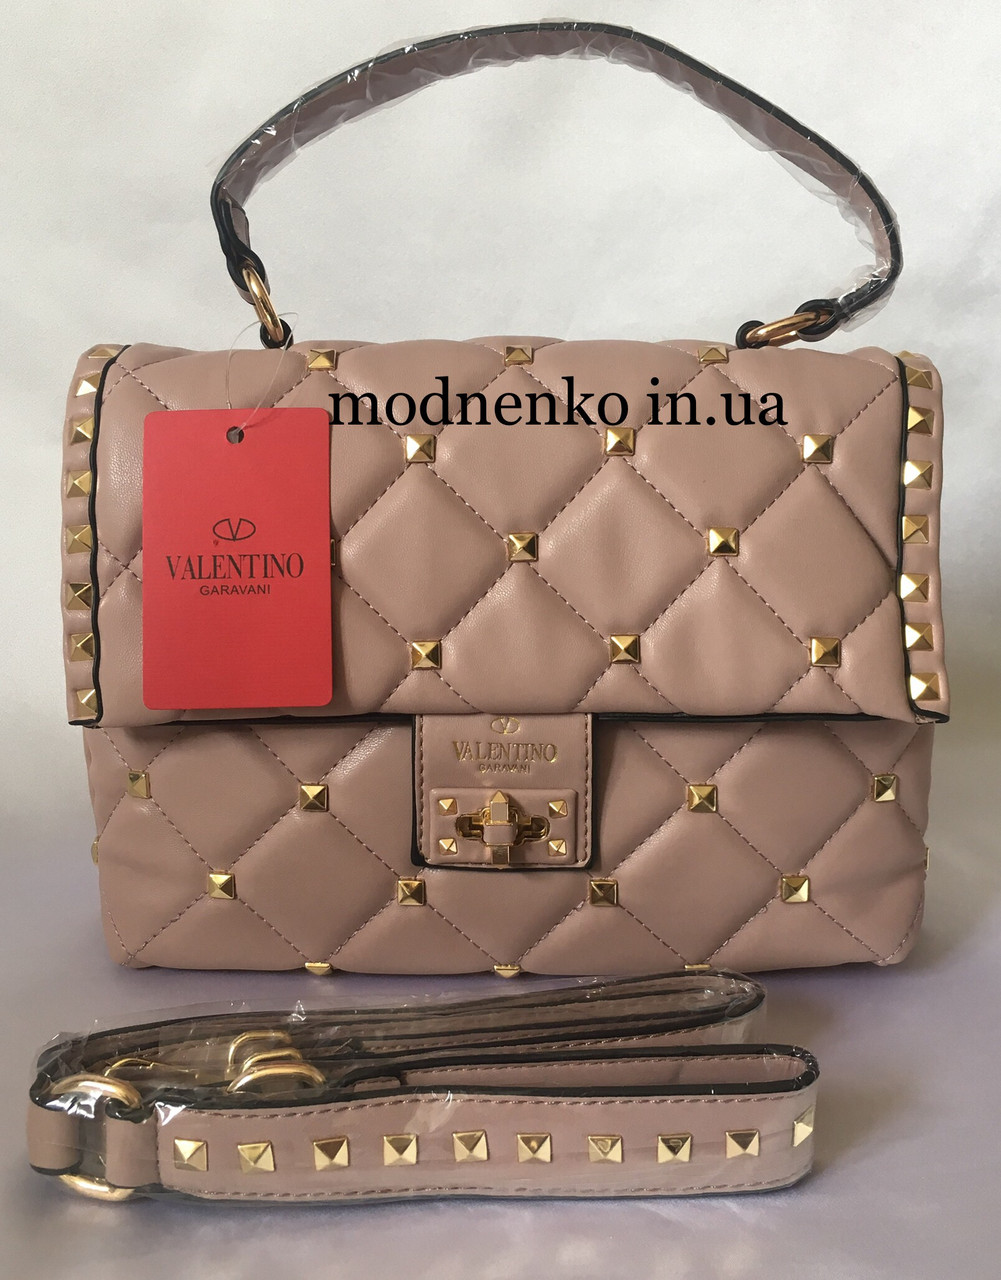 87a46d4f3c86 Женская сумка Valentino GARAVANI VLTN эко кожа: продажа, цена в ...